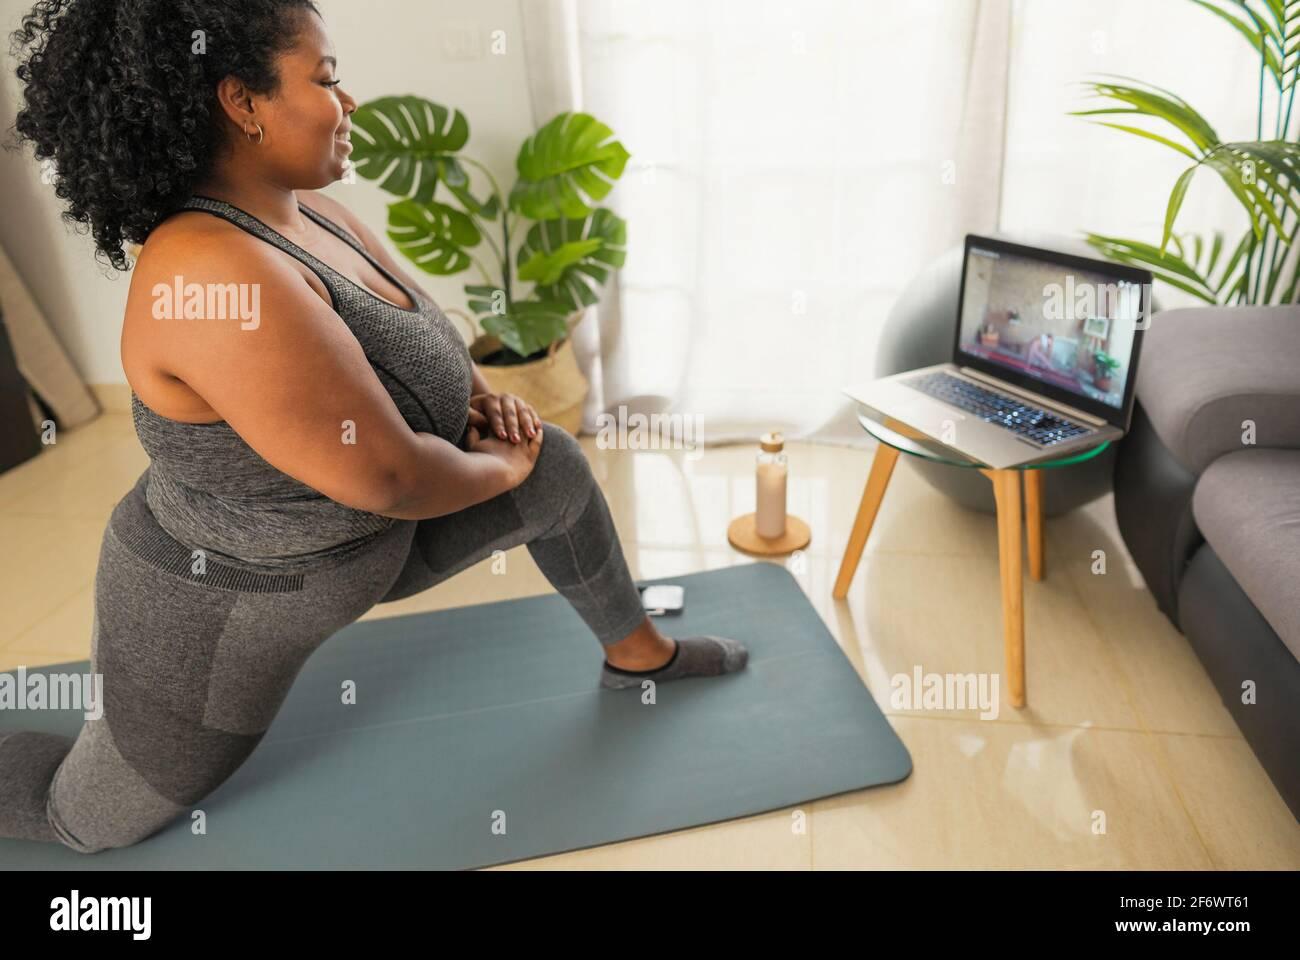 Junge afrikanische Frau macht Pilates virtuellen Fitness-Kurs mit Laptop Zu Hause - Sport Wellness People Lifestyle Konzept Stockfoto